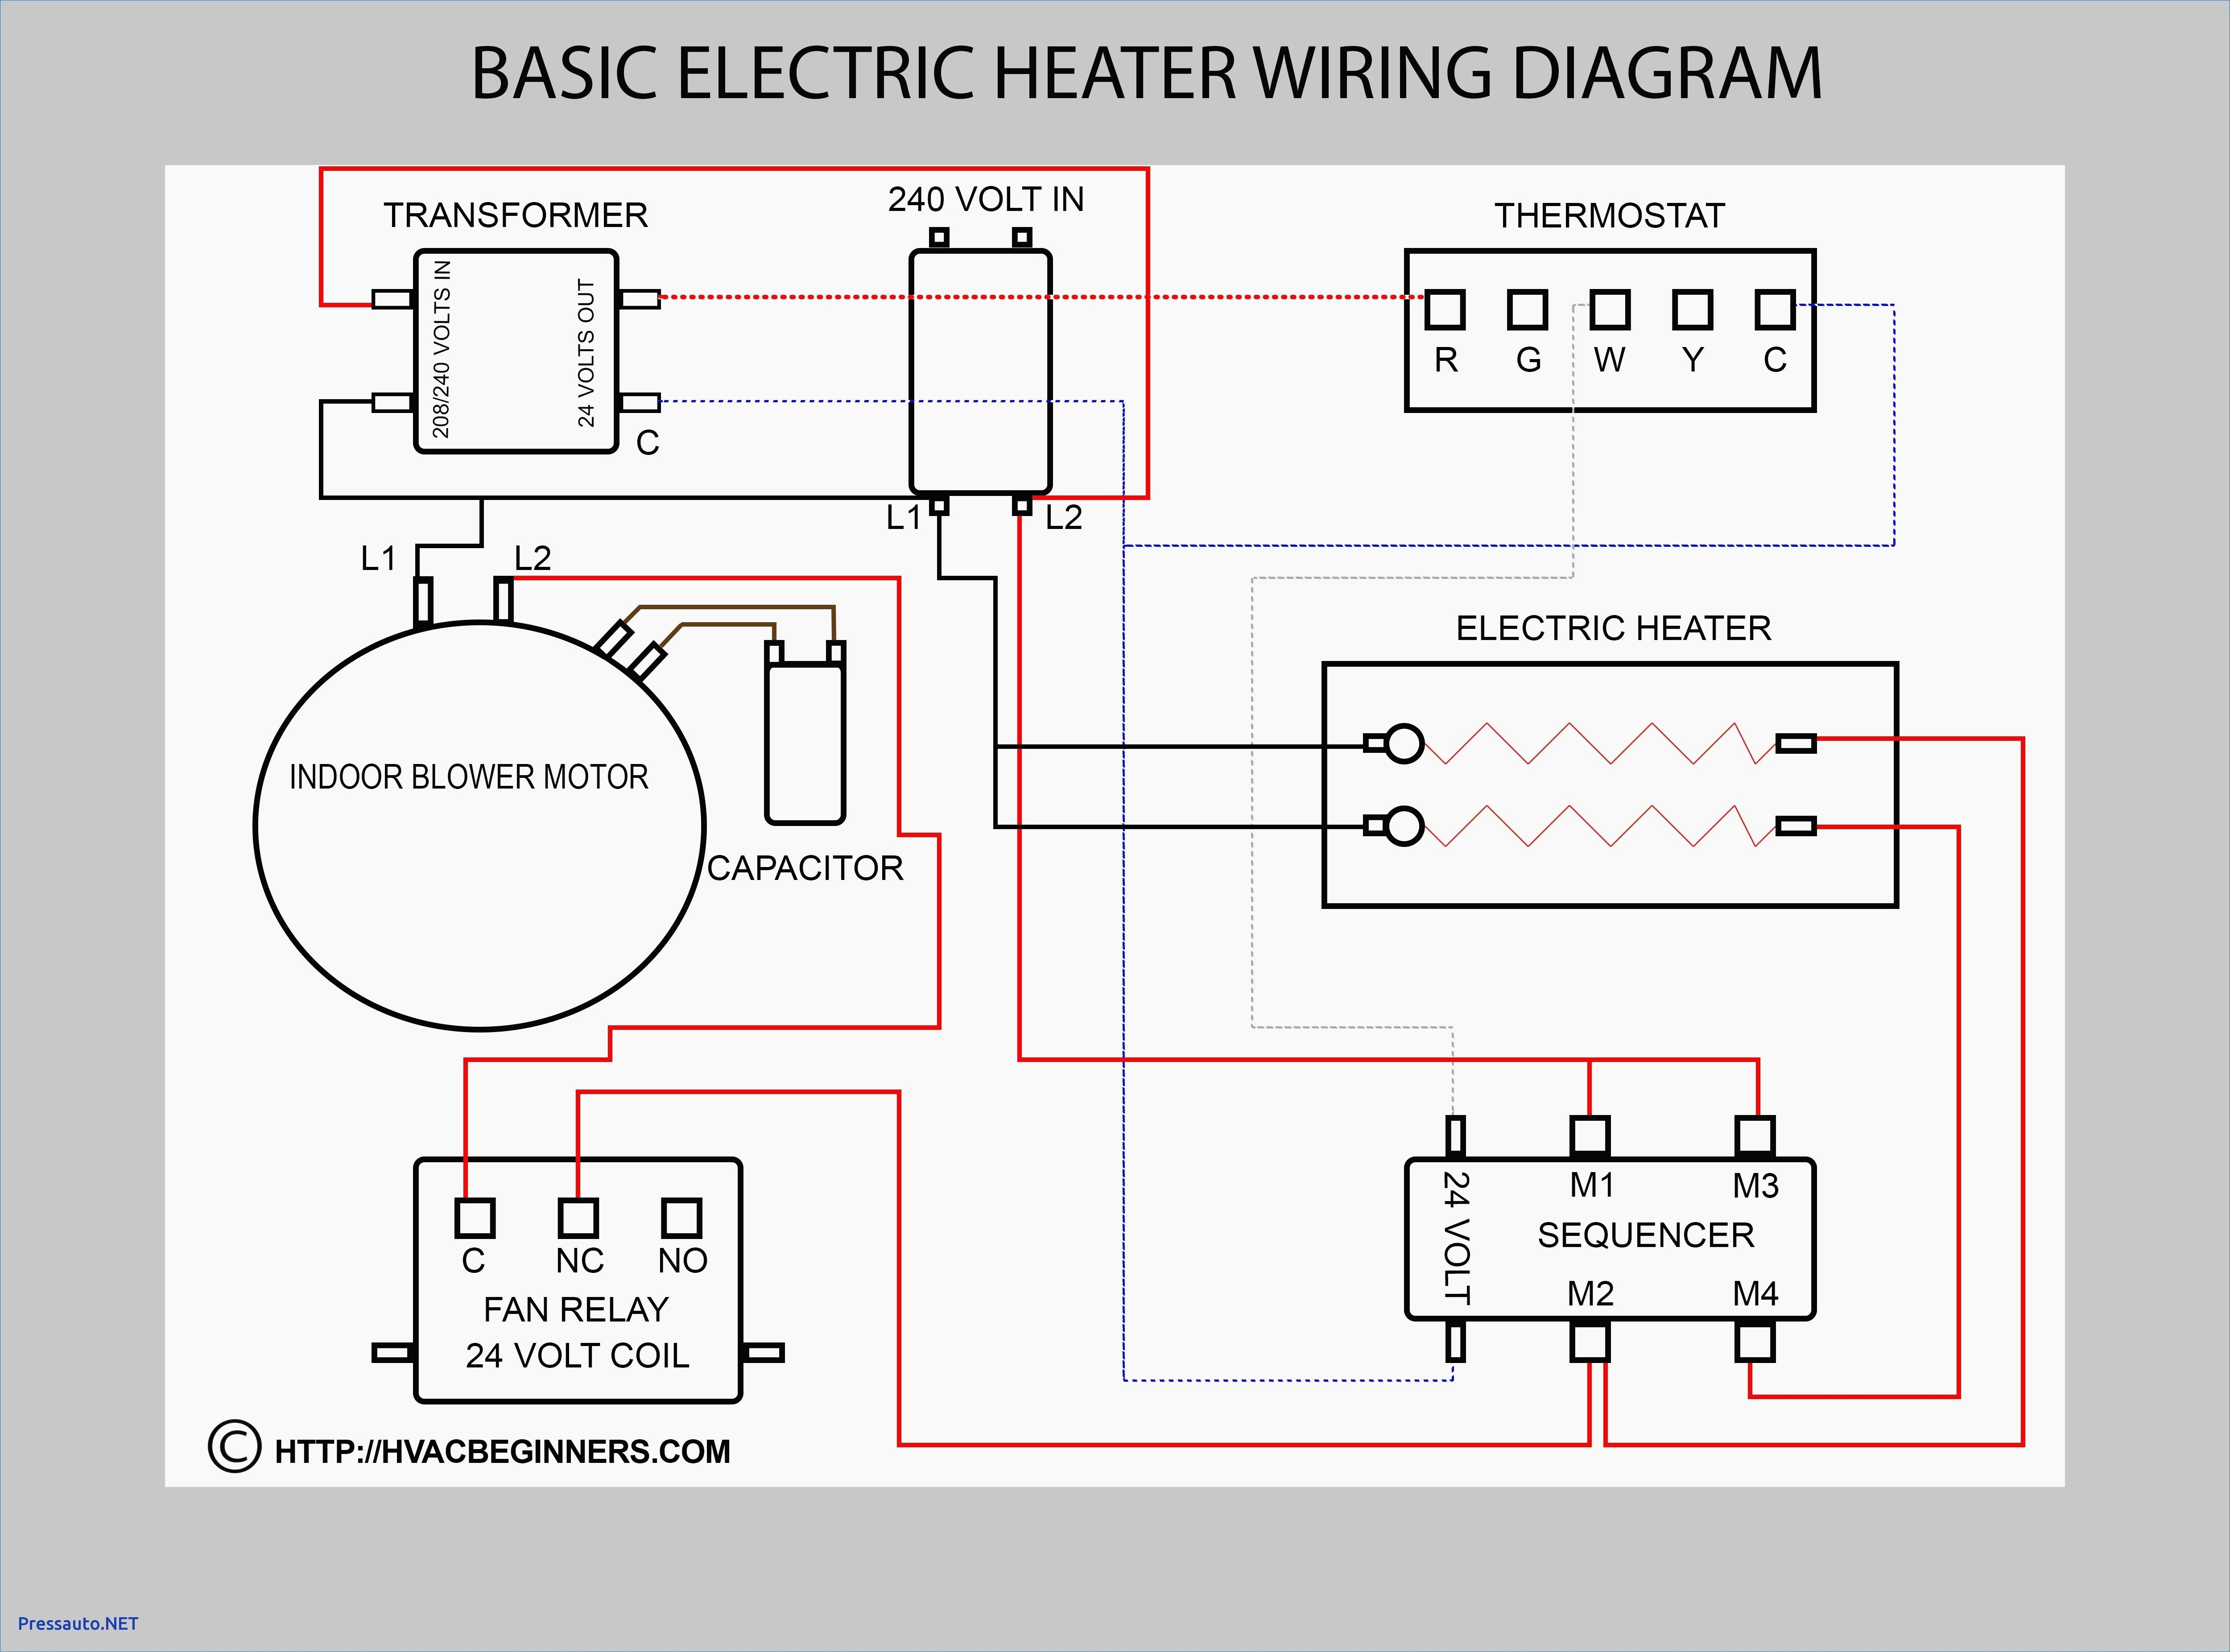 goodman heat pump wiring diagram thermostat free wiring. Black Bedroom Furniture Sets. Home Design Ideas